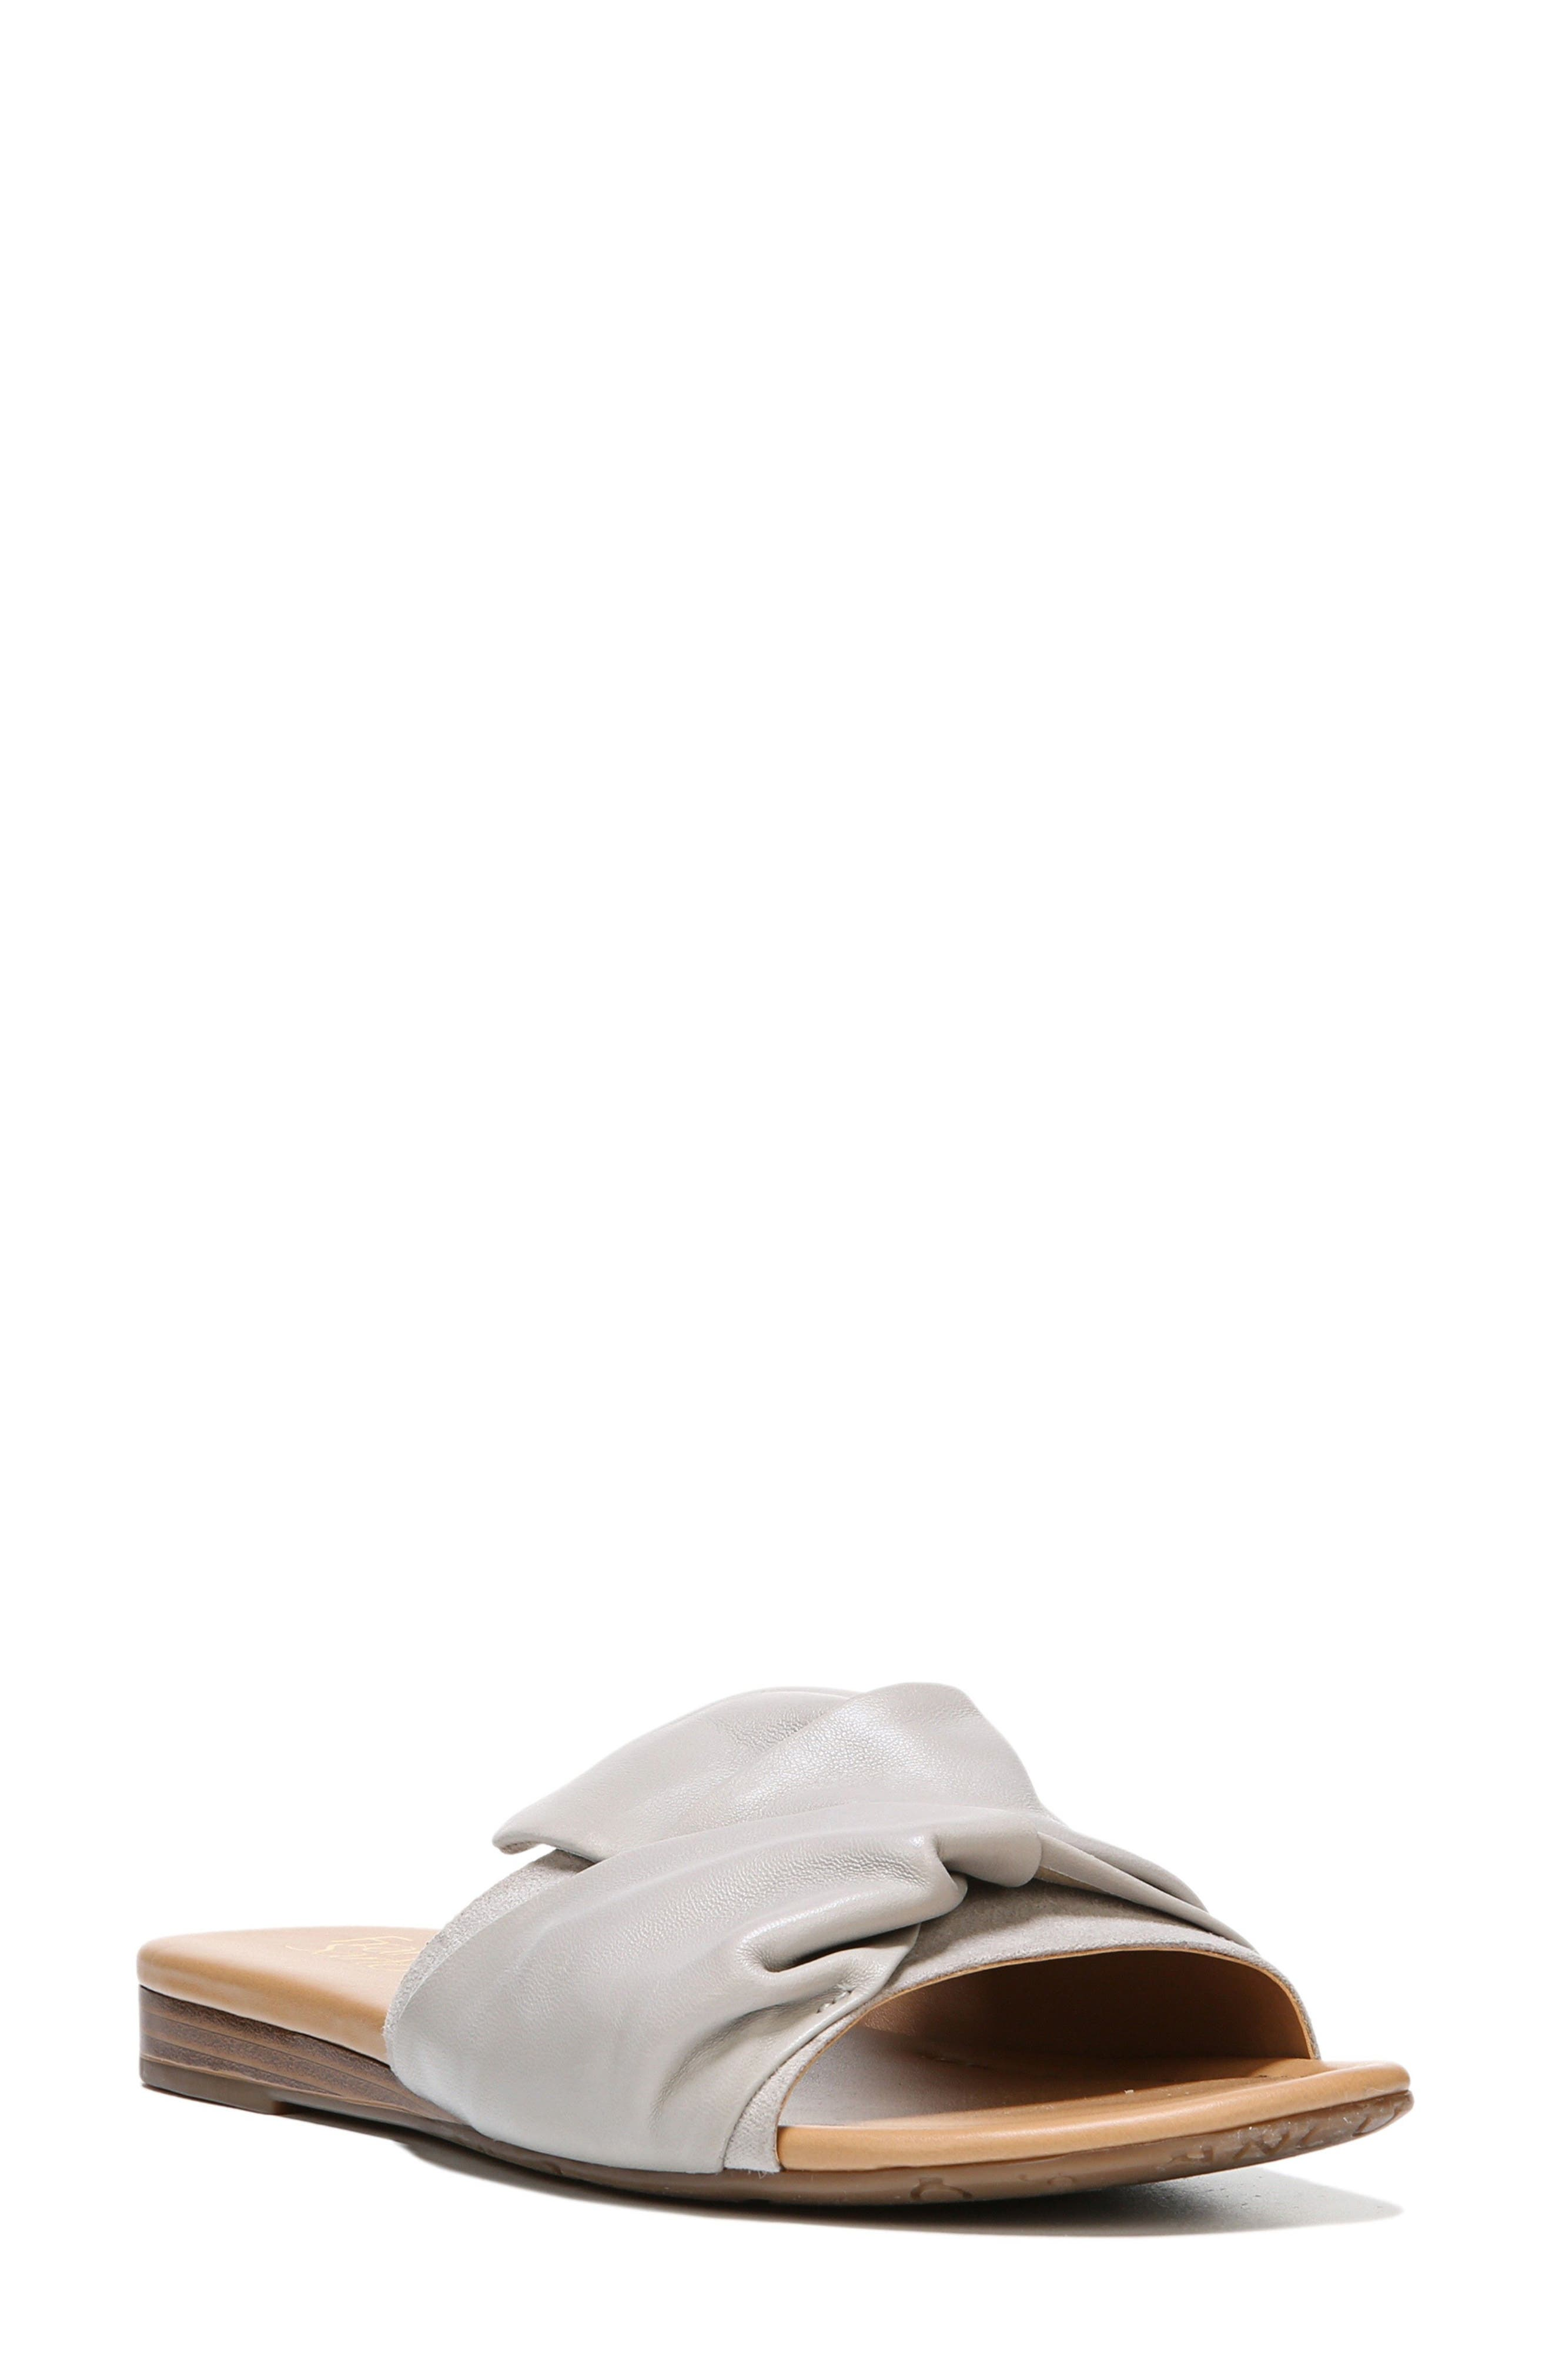 Gracelyn Slide Sandal,                             Main thumbnail 1, color,                             020